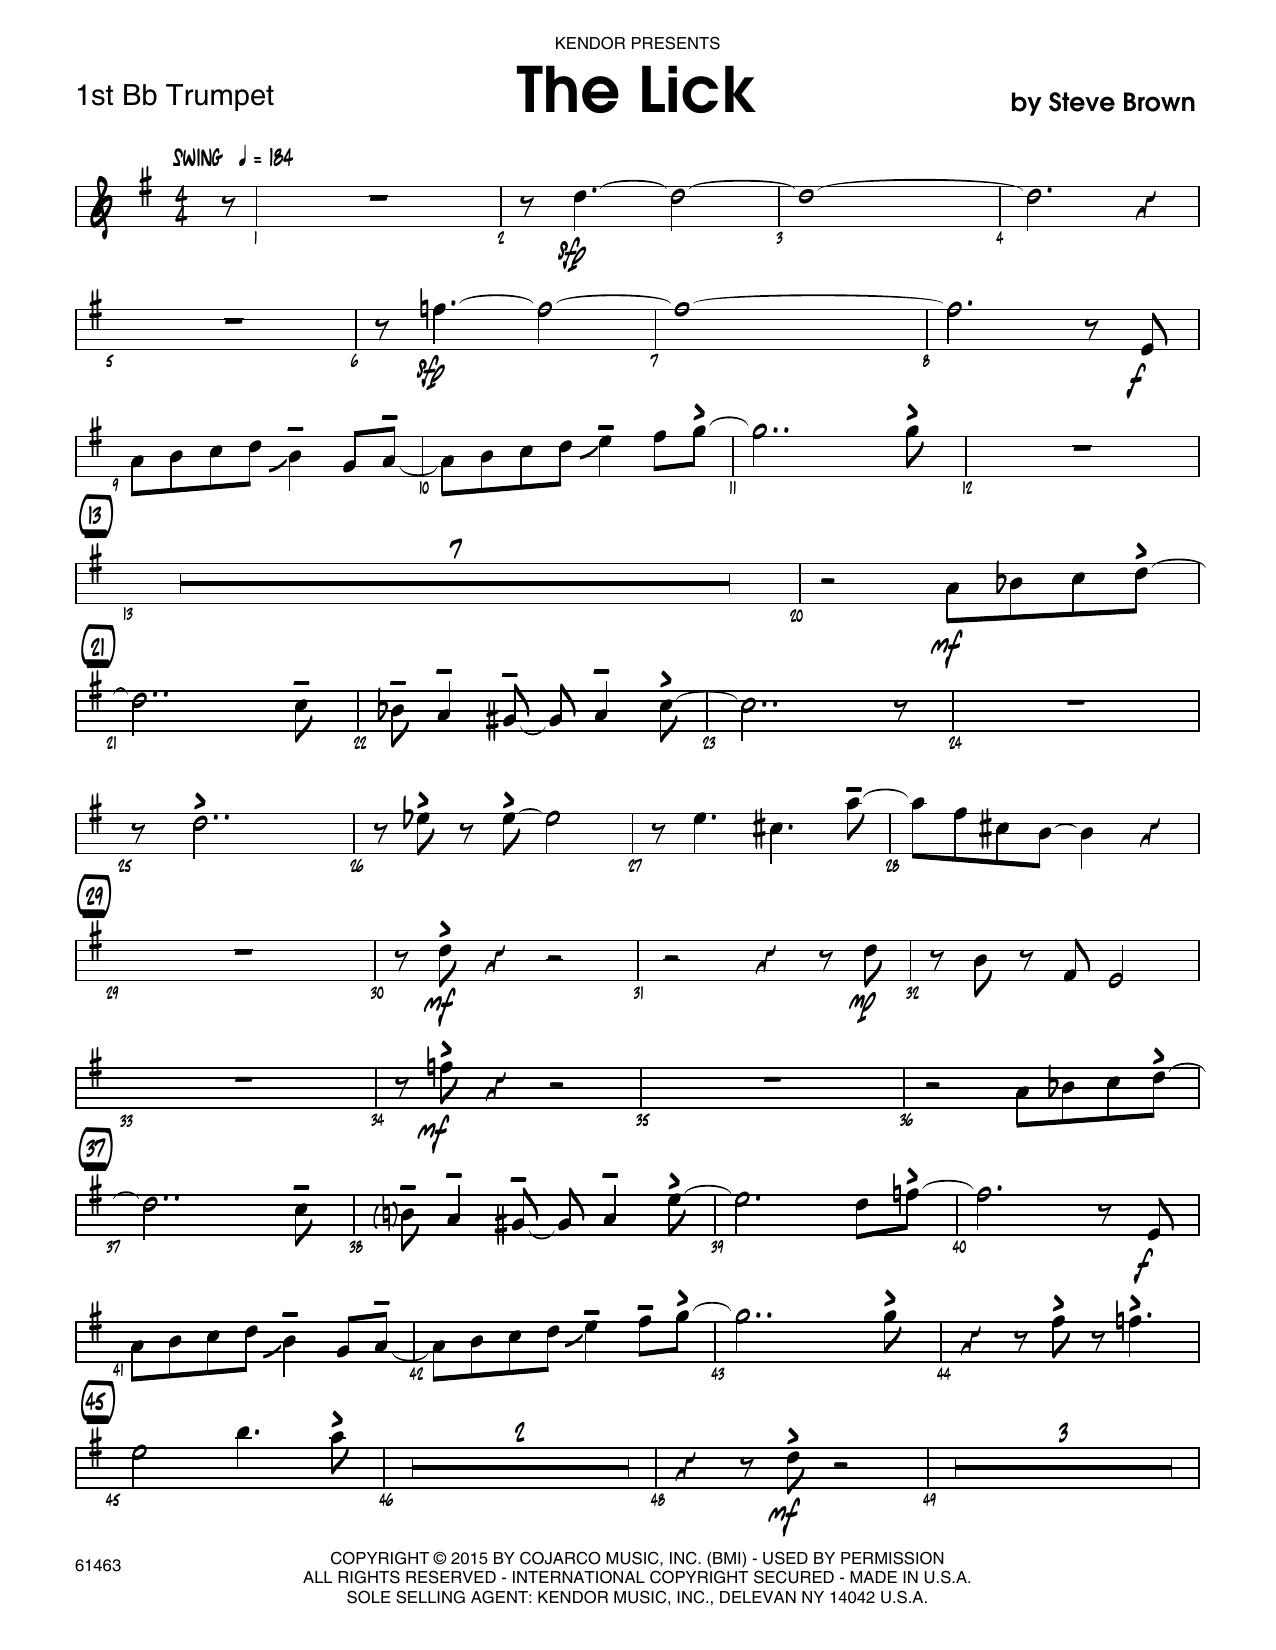 The Lick - 1st Bb Trumpet